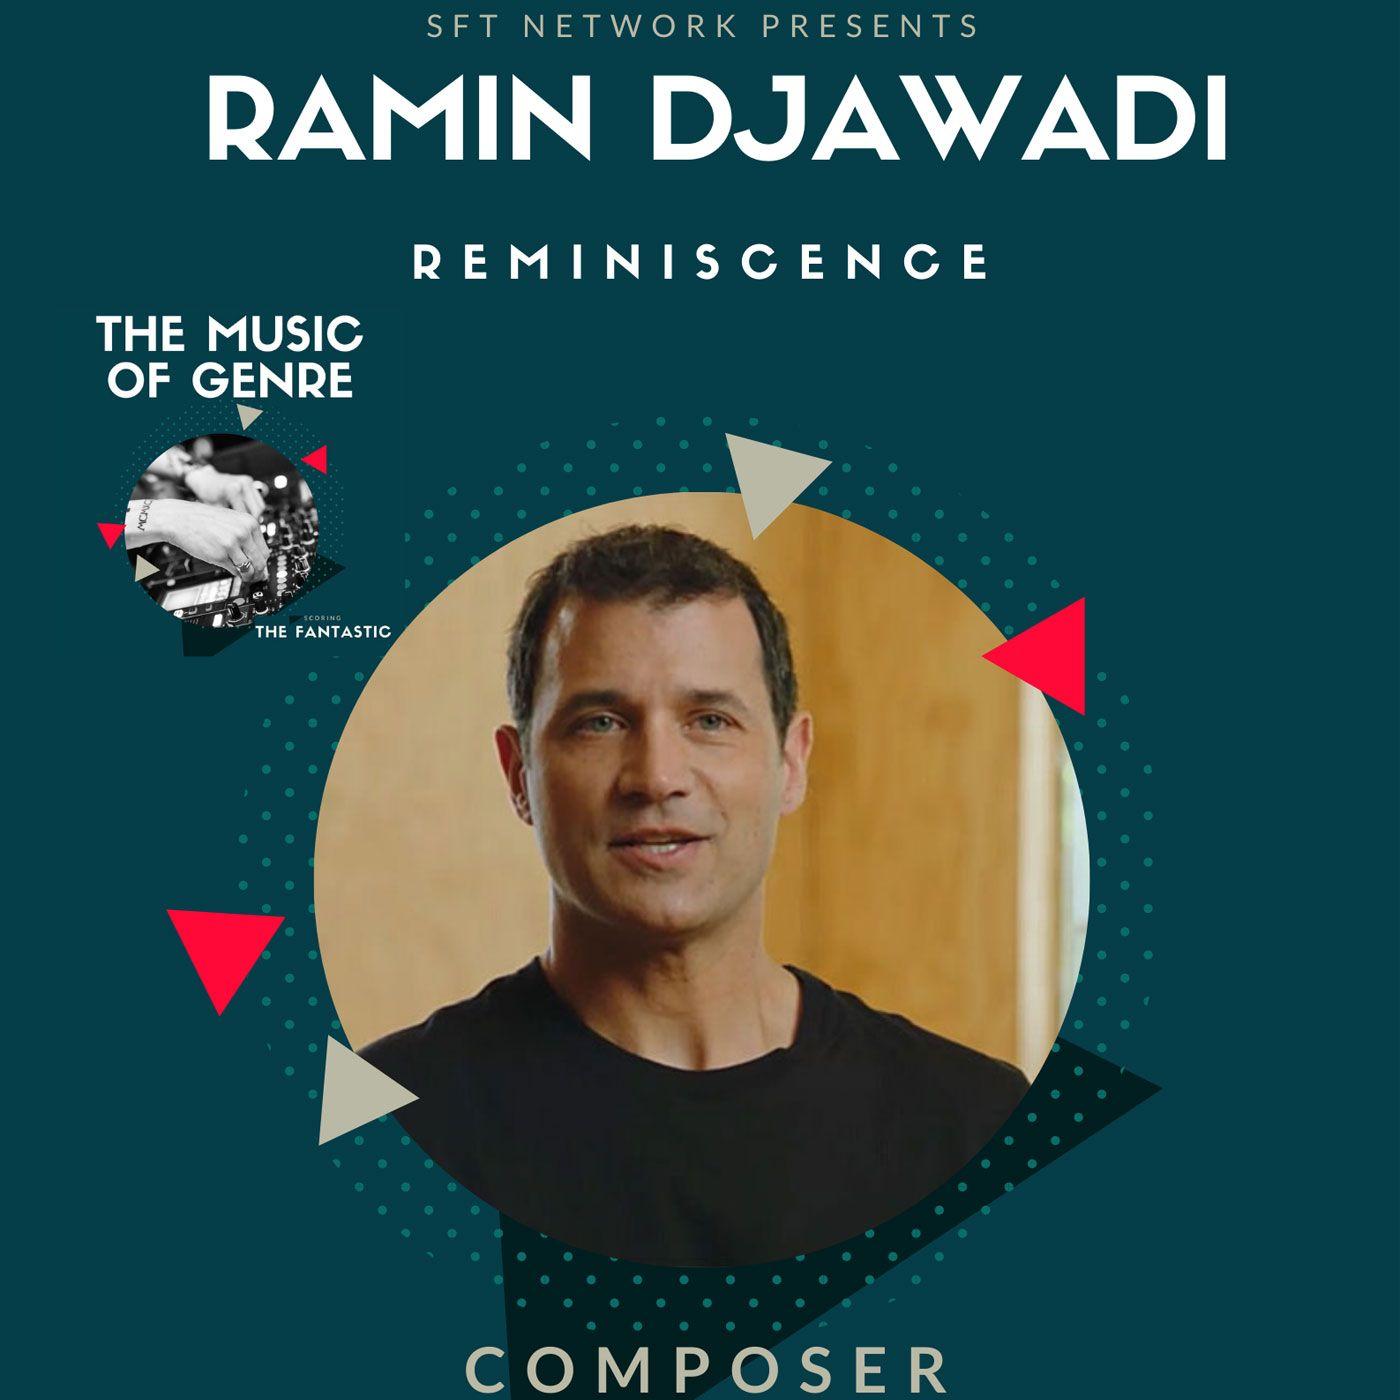 Ramin Djawadi Reminiscence Composer